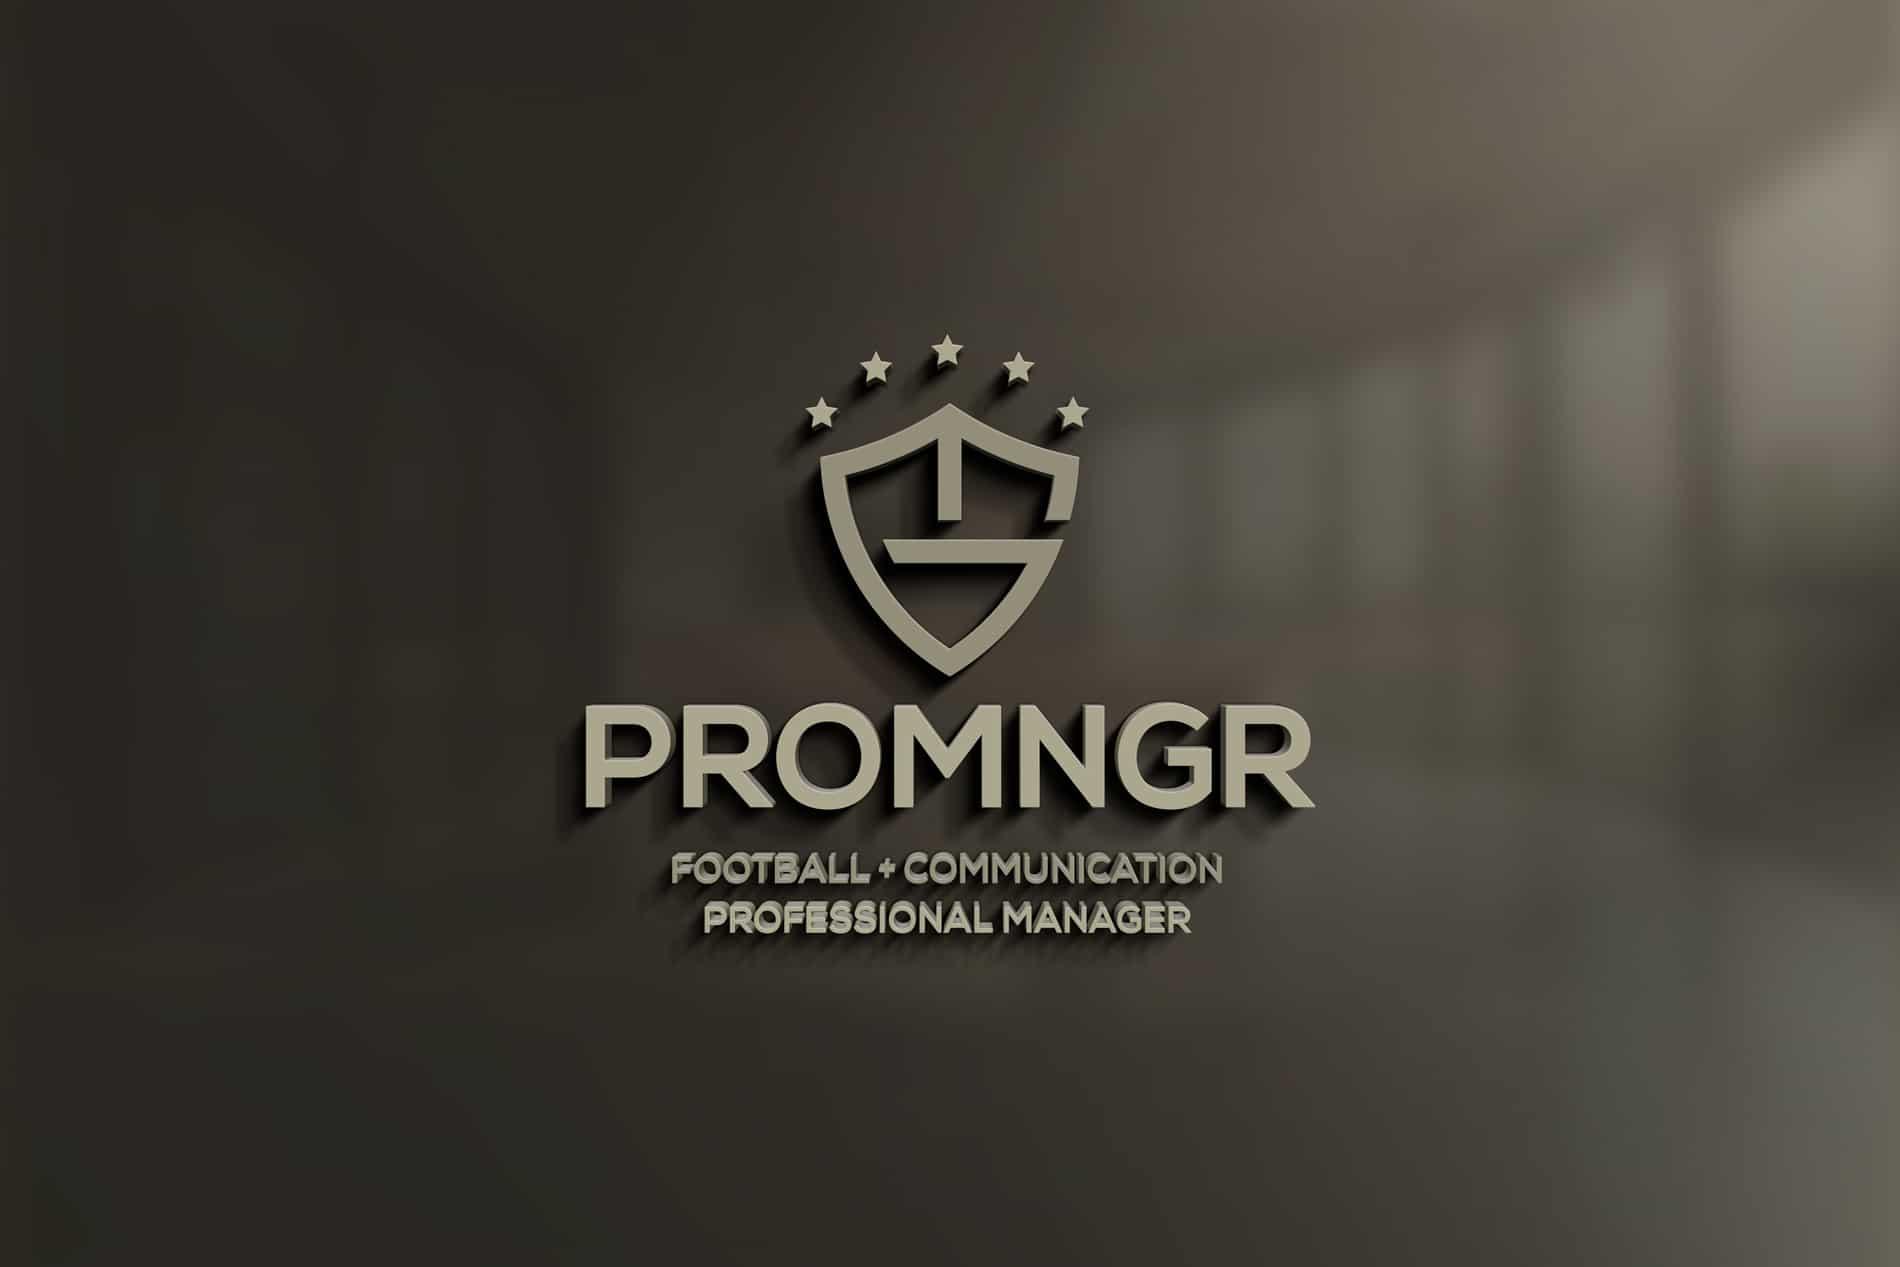 PROMNGR